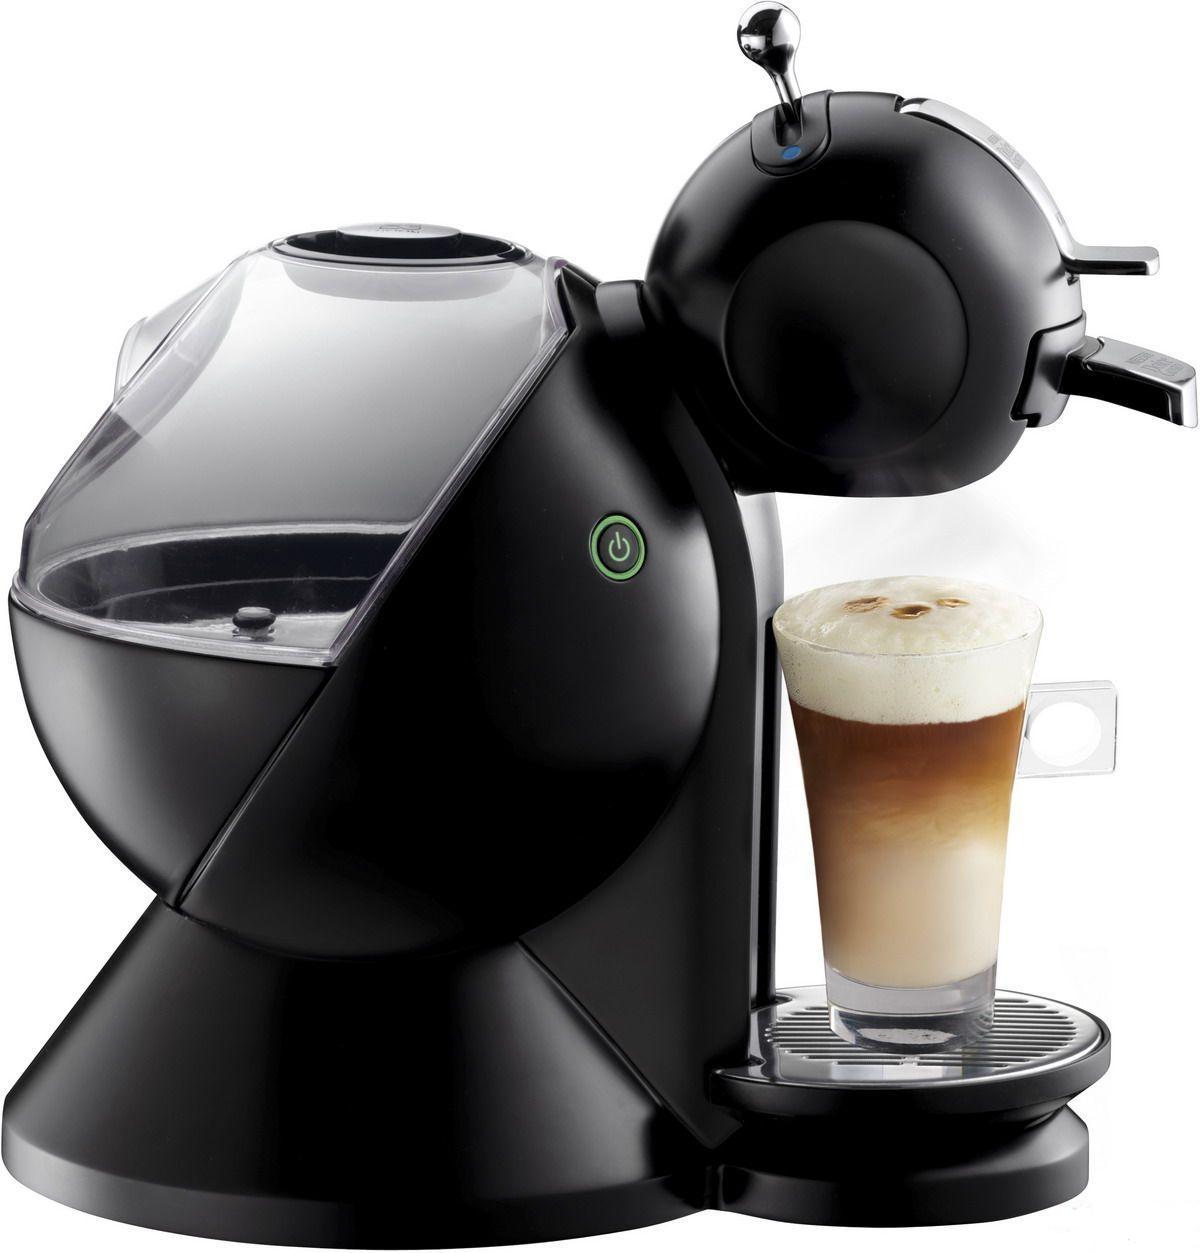 Кофеварка Krups KP210025 (DolceGusto Black)